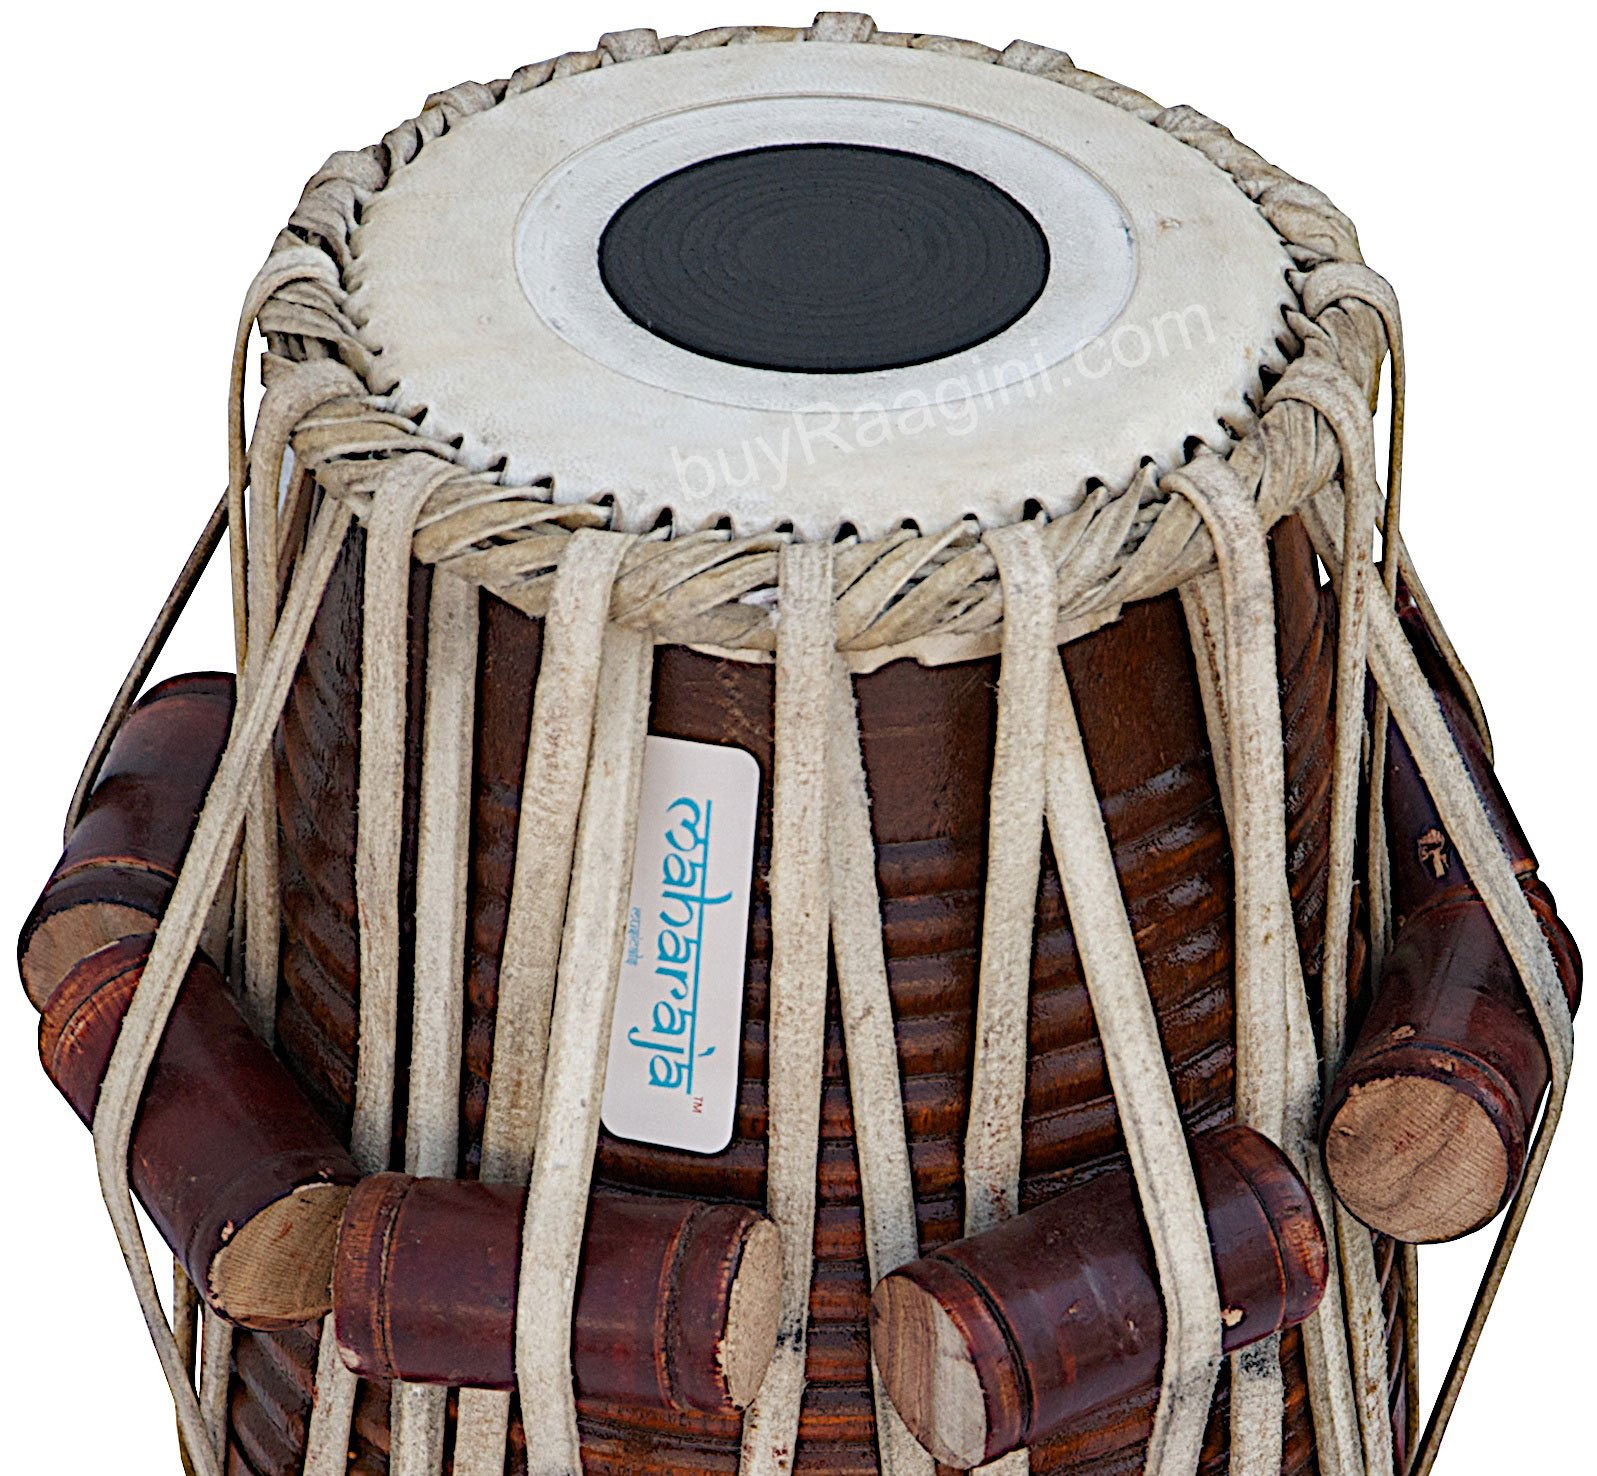 Tabla Set by Maharaja Musicals, Golden Brass Bayan 3Kg, Sheesham Dayan Tabla, Nylon Bag, Hammer, Book, Cushions, Cover, Tabla Indian Drums (PDI-CH) by Maharaja Musicals (Image #6)